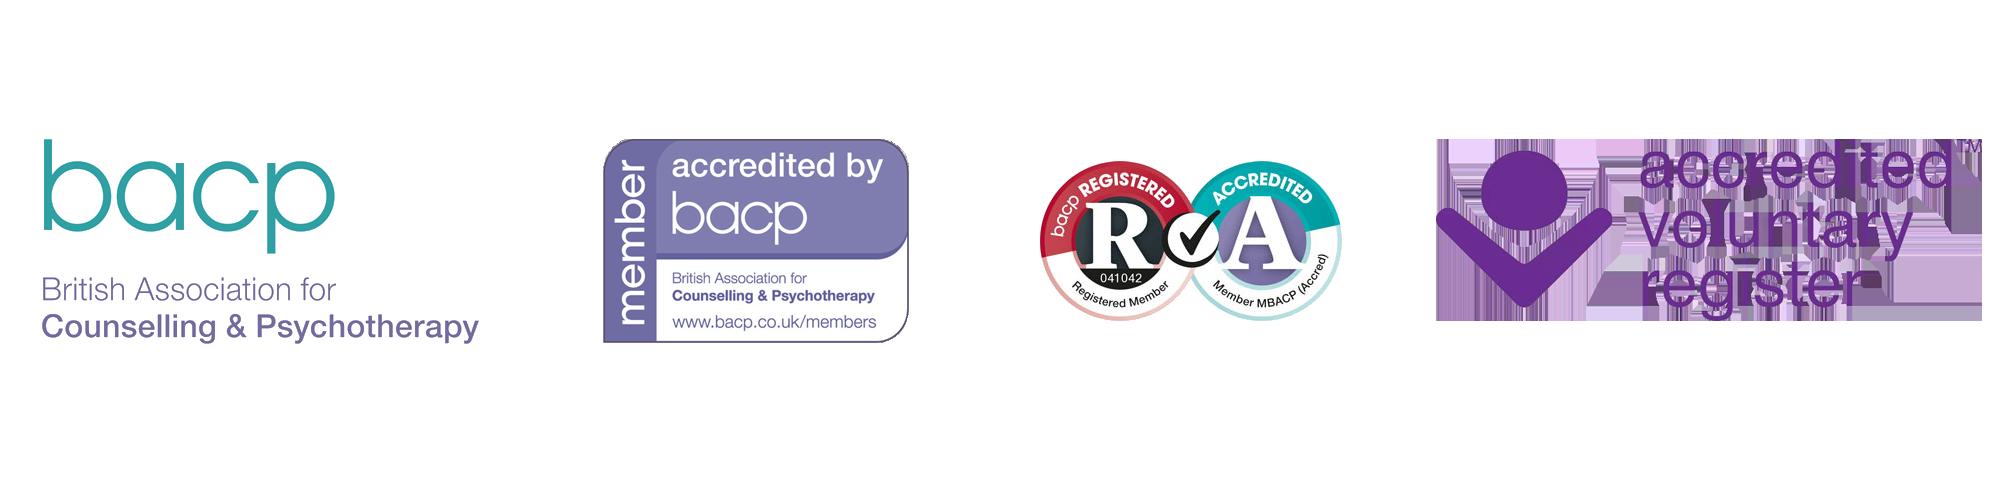 counselling-psychotherapy-mindfulness-bacp-trusted-salisbury-newbury-willsmither